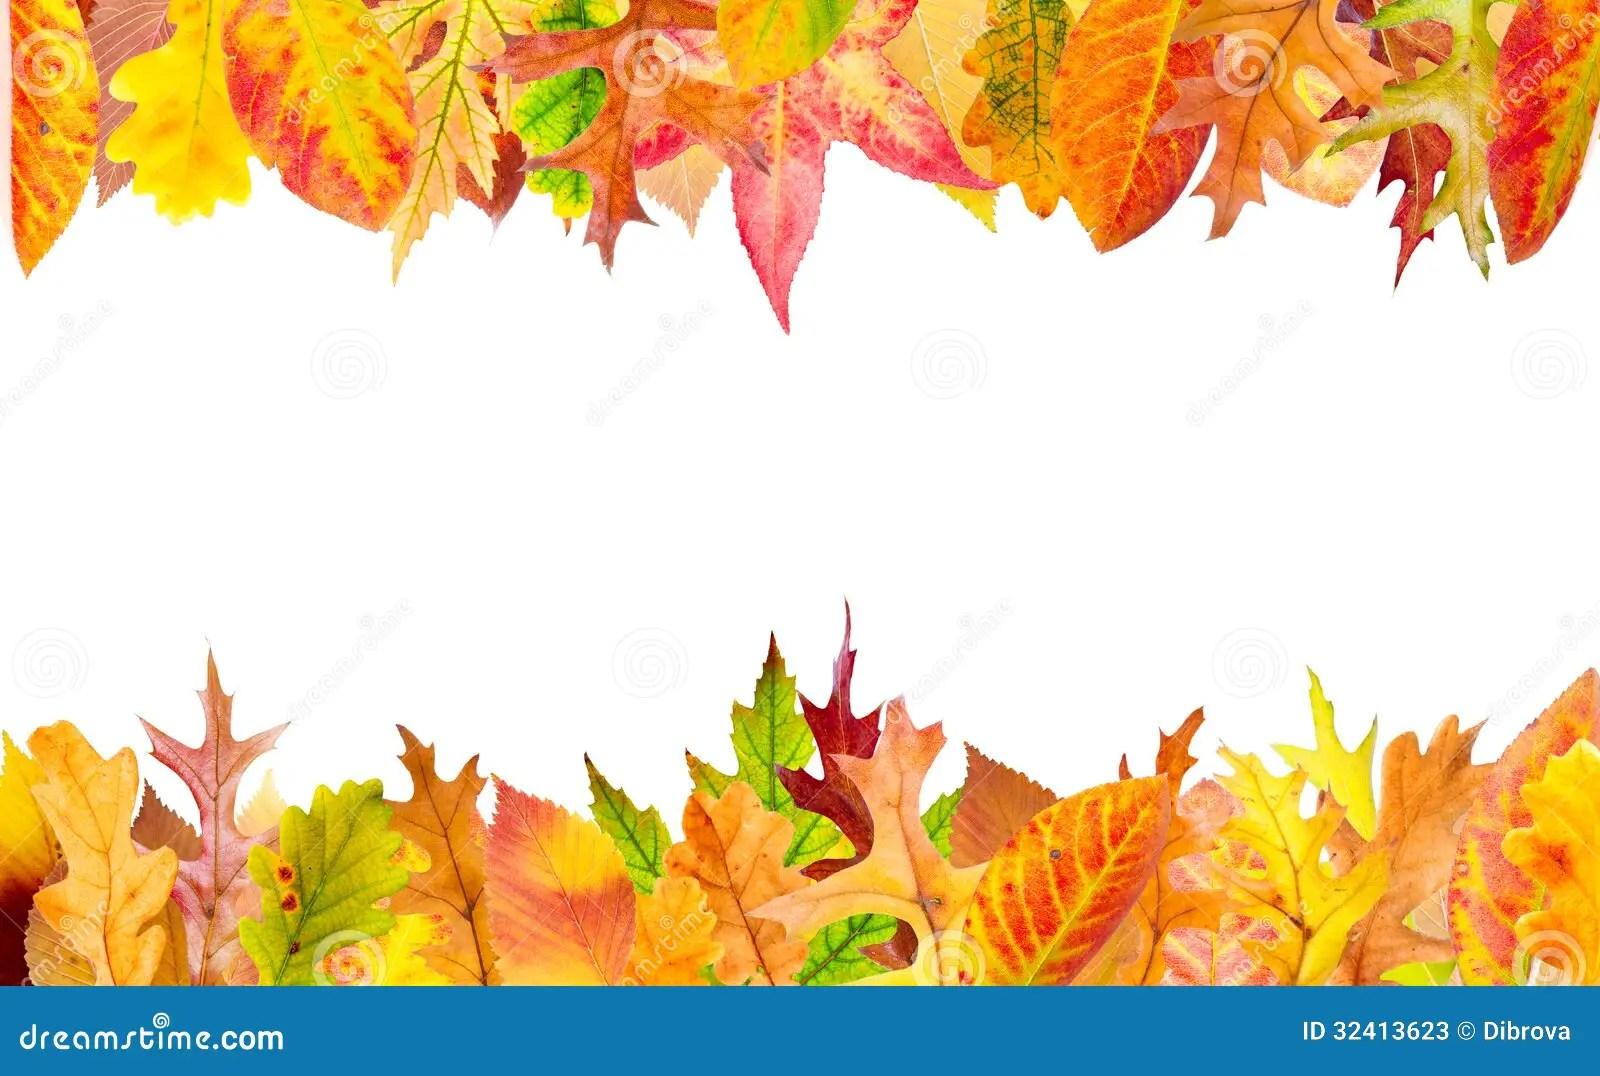 Fall Wallpaper Border Autumn Frame Stock Image Image Of Orange Decoration